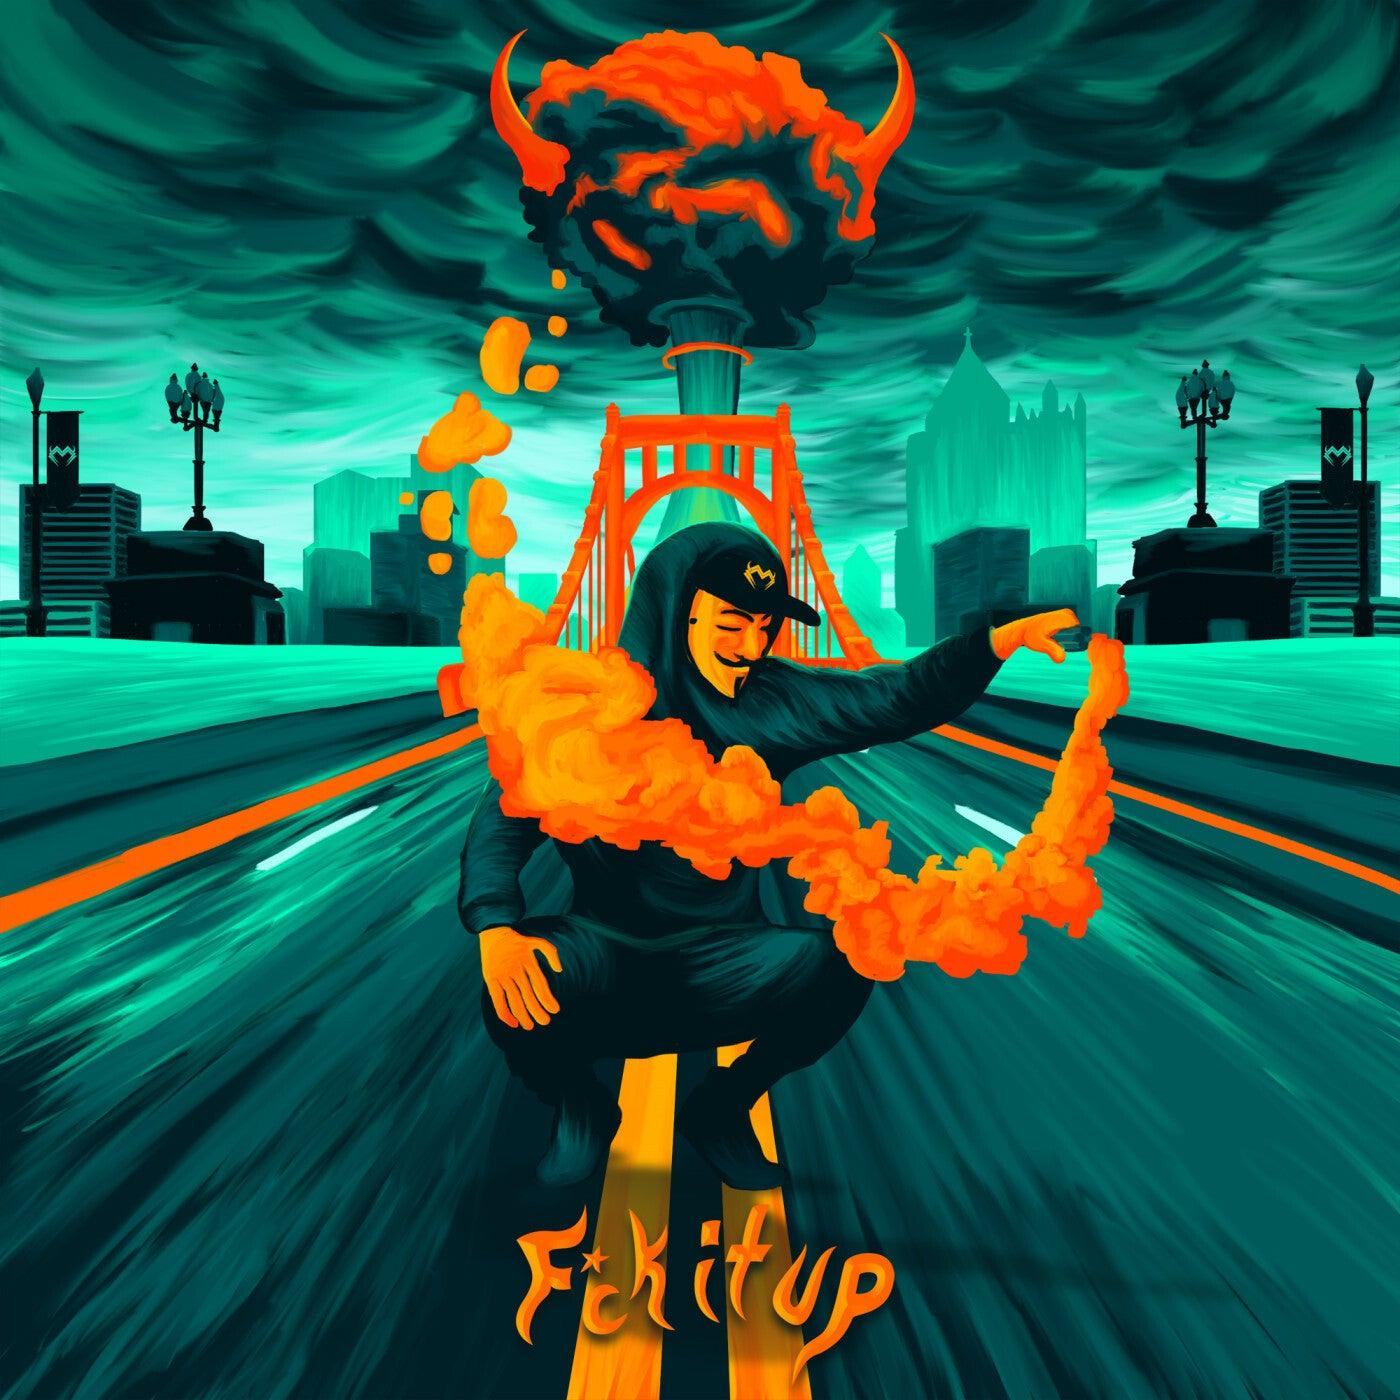 Fck It Up (Original Mix)